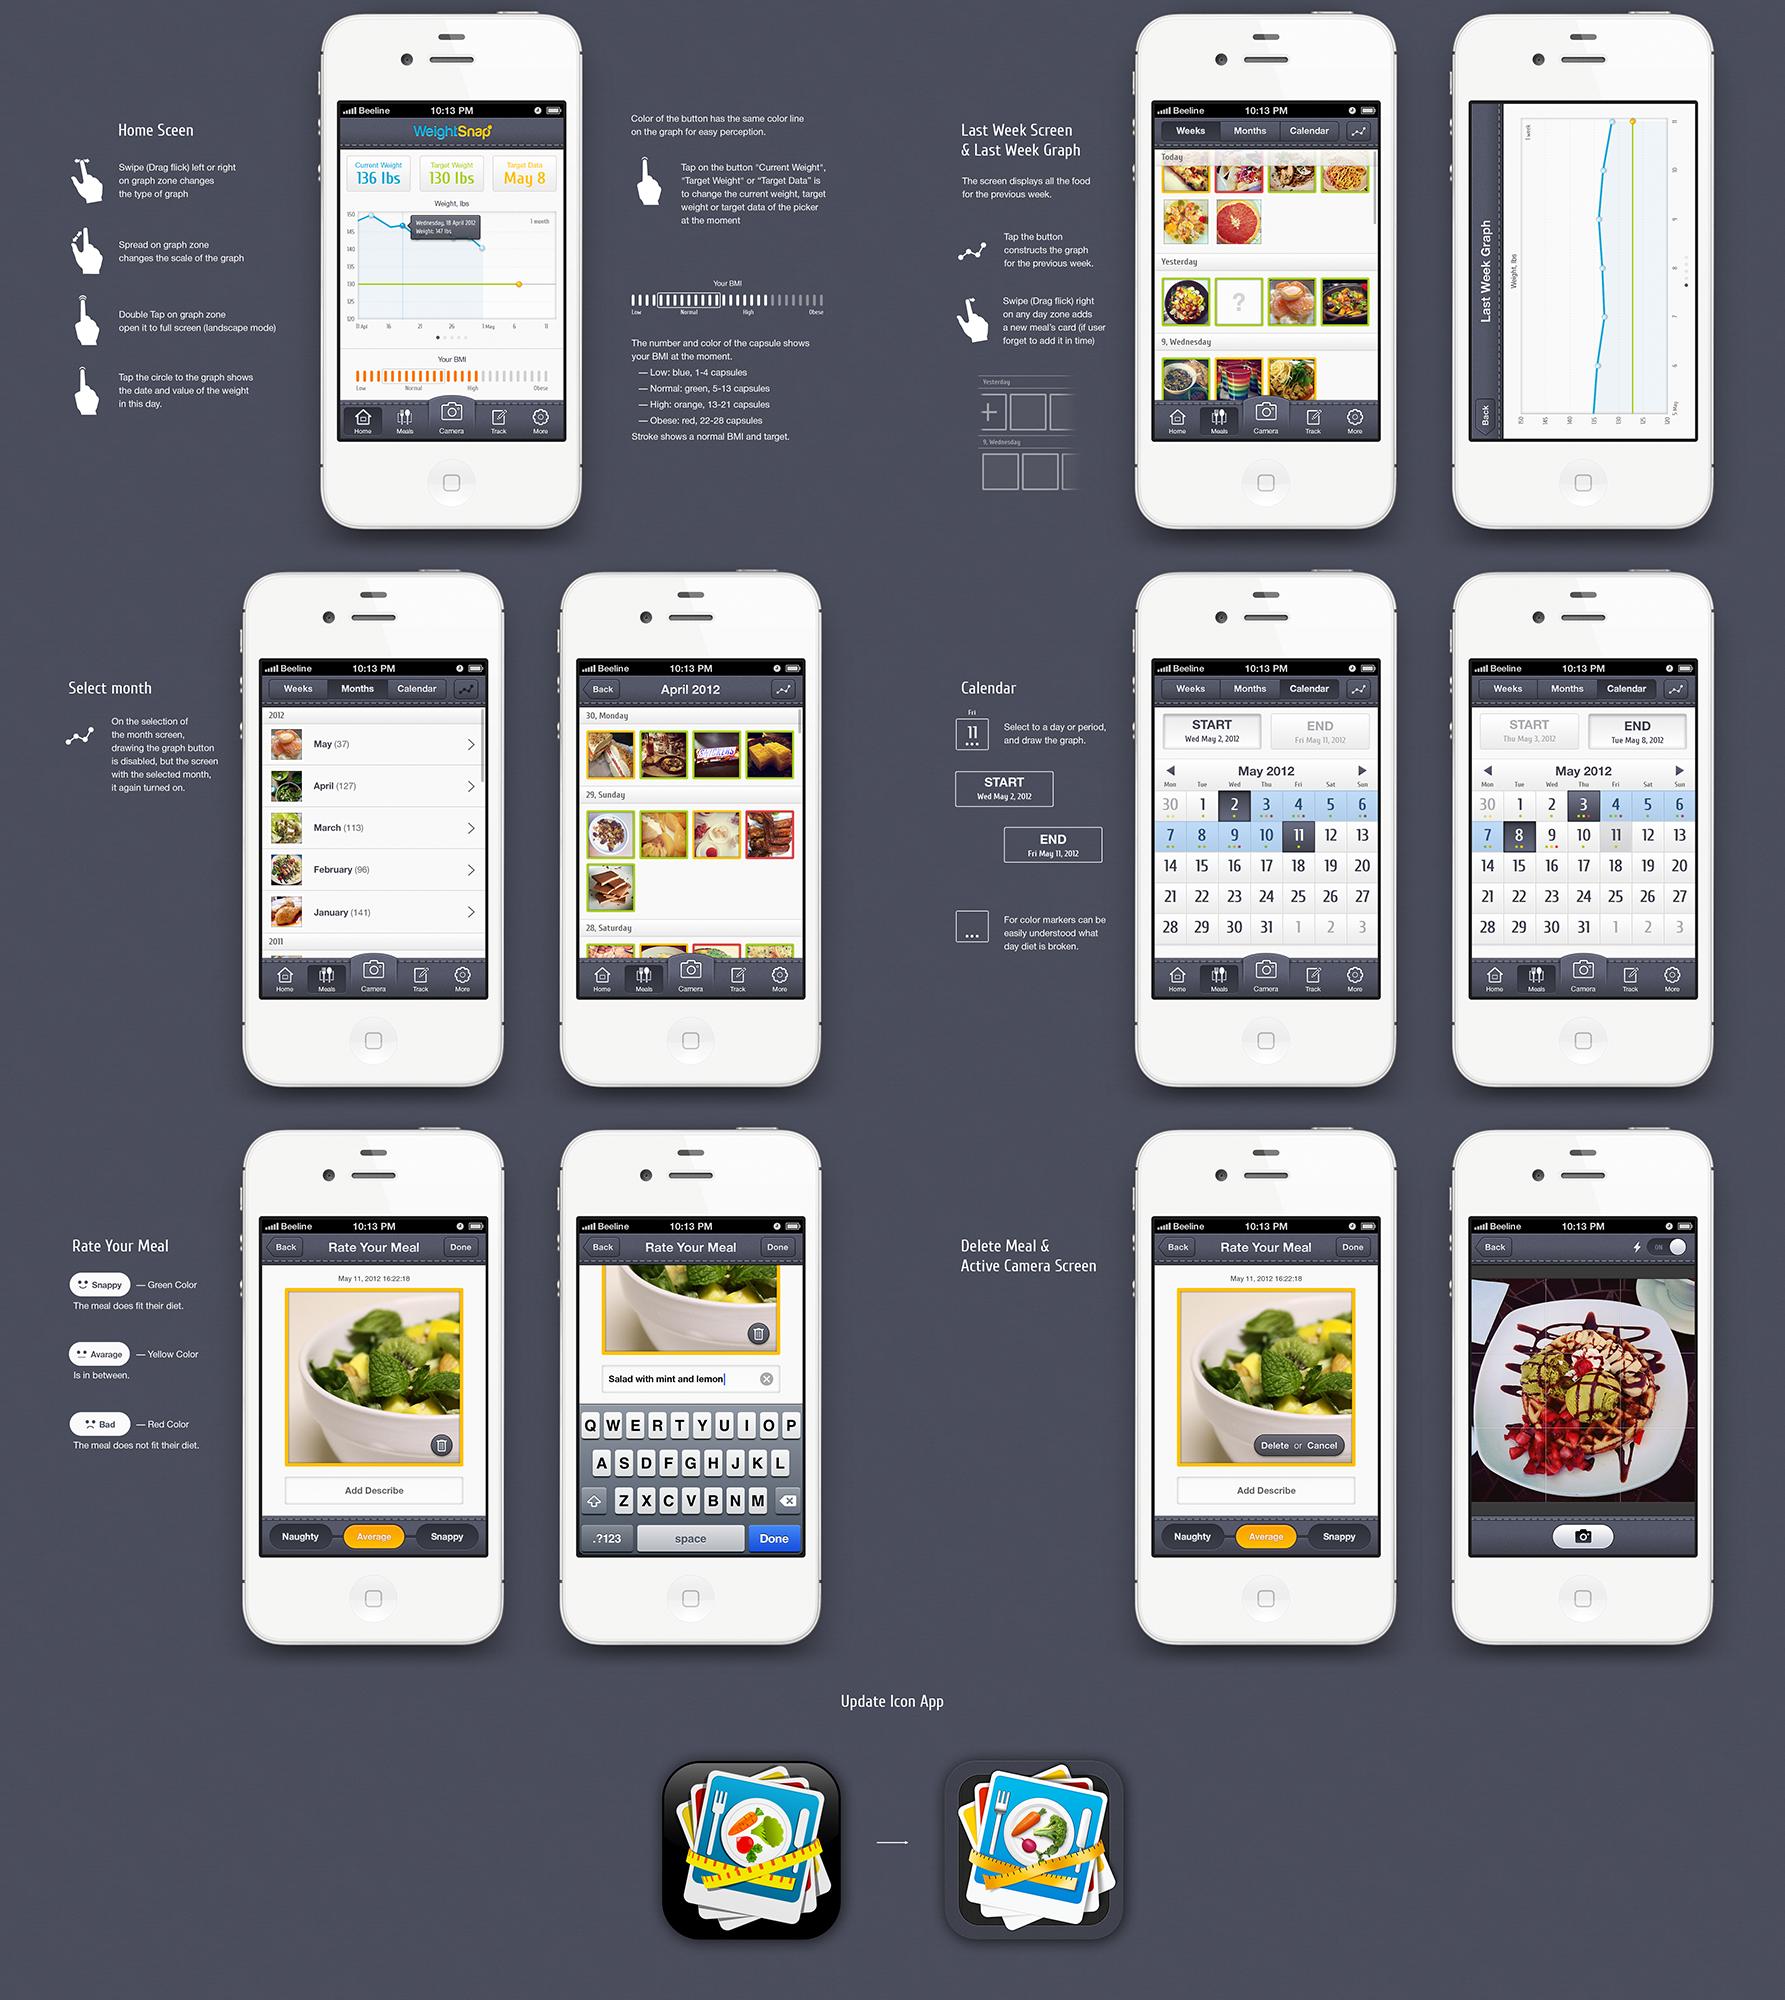 Weight Loss iPhone App - Screen Designs